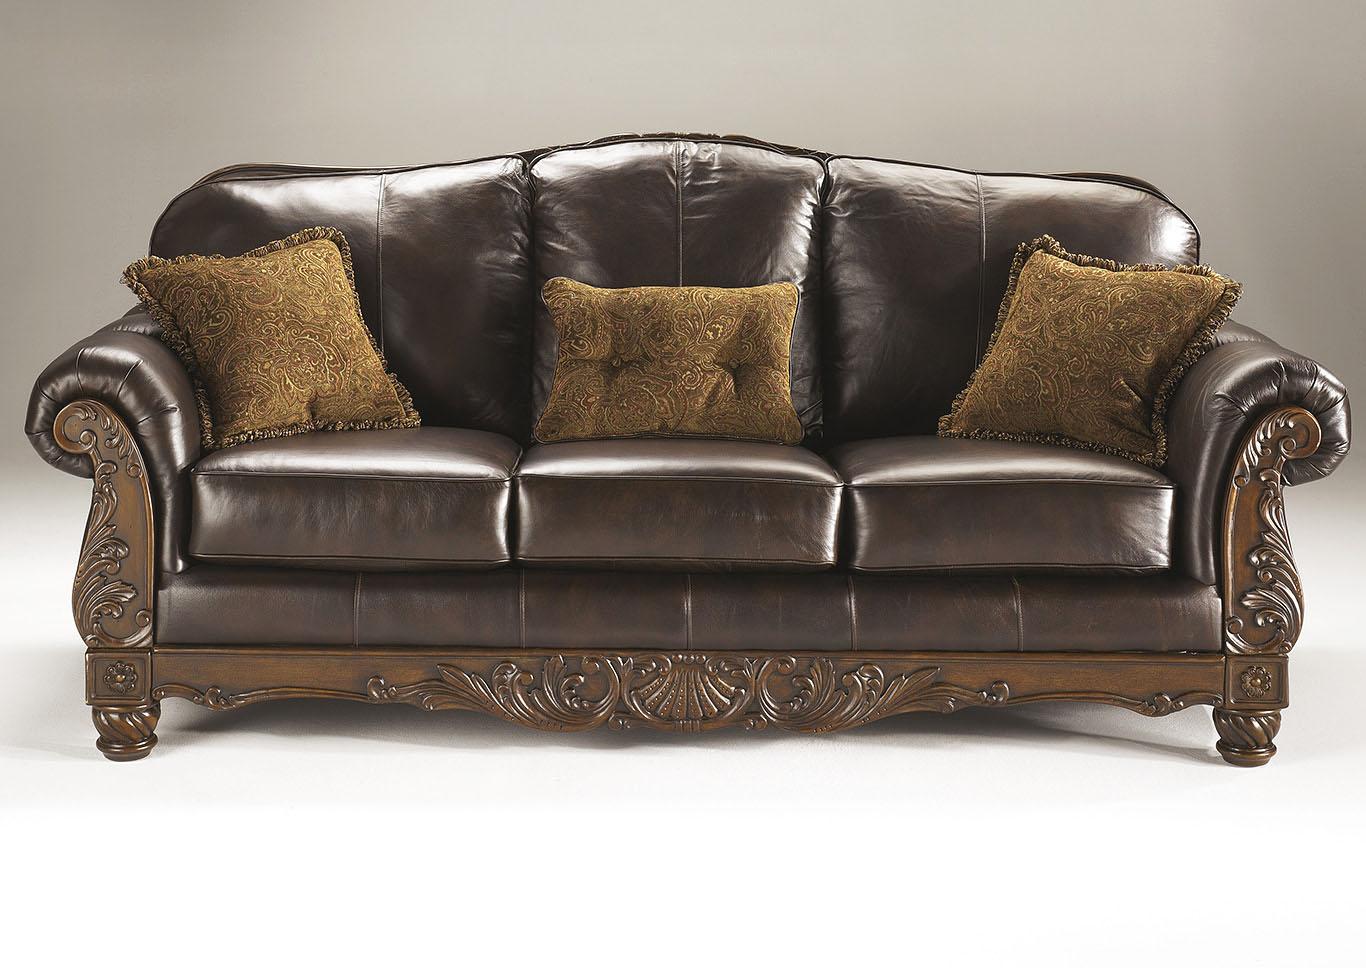 living room furniture brooklyn small seating new home ny north shore dark brown sofa